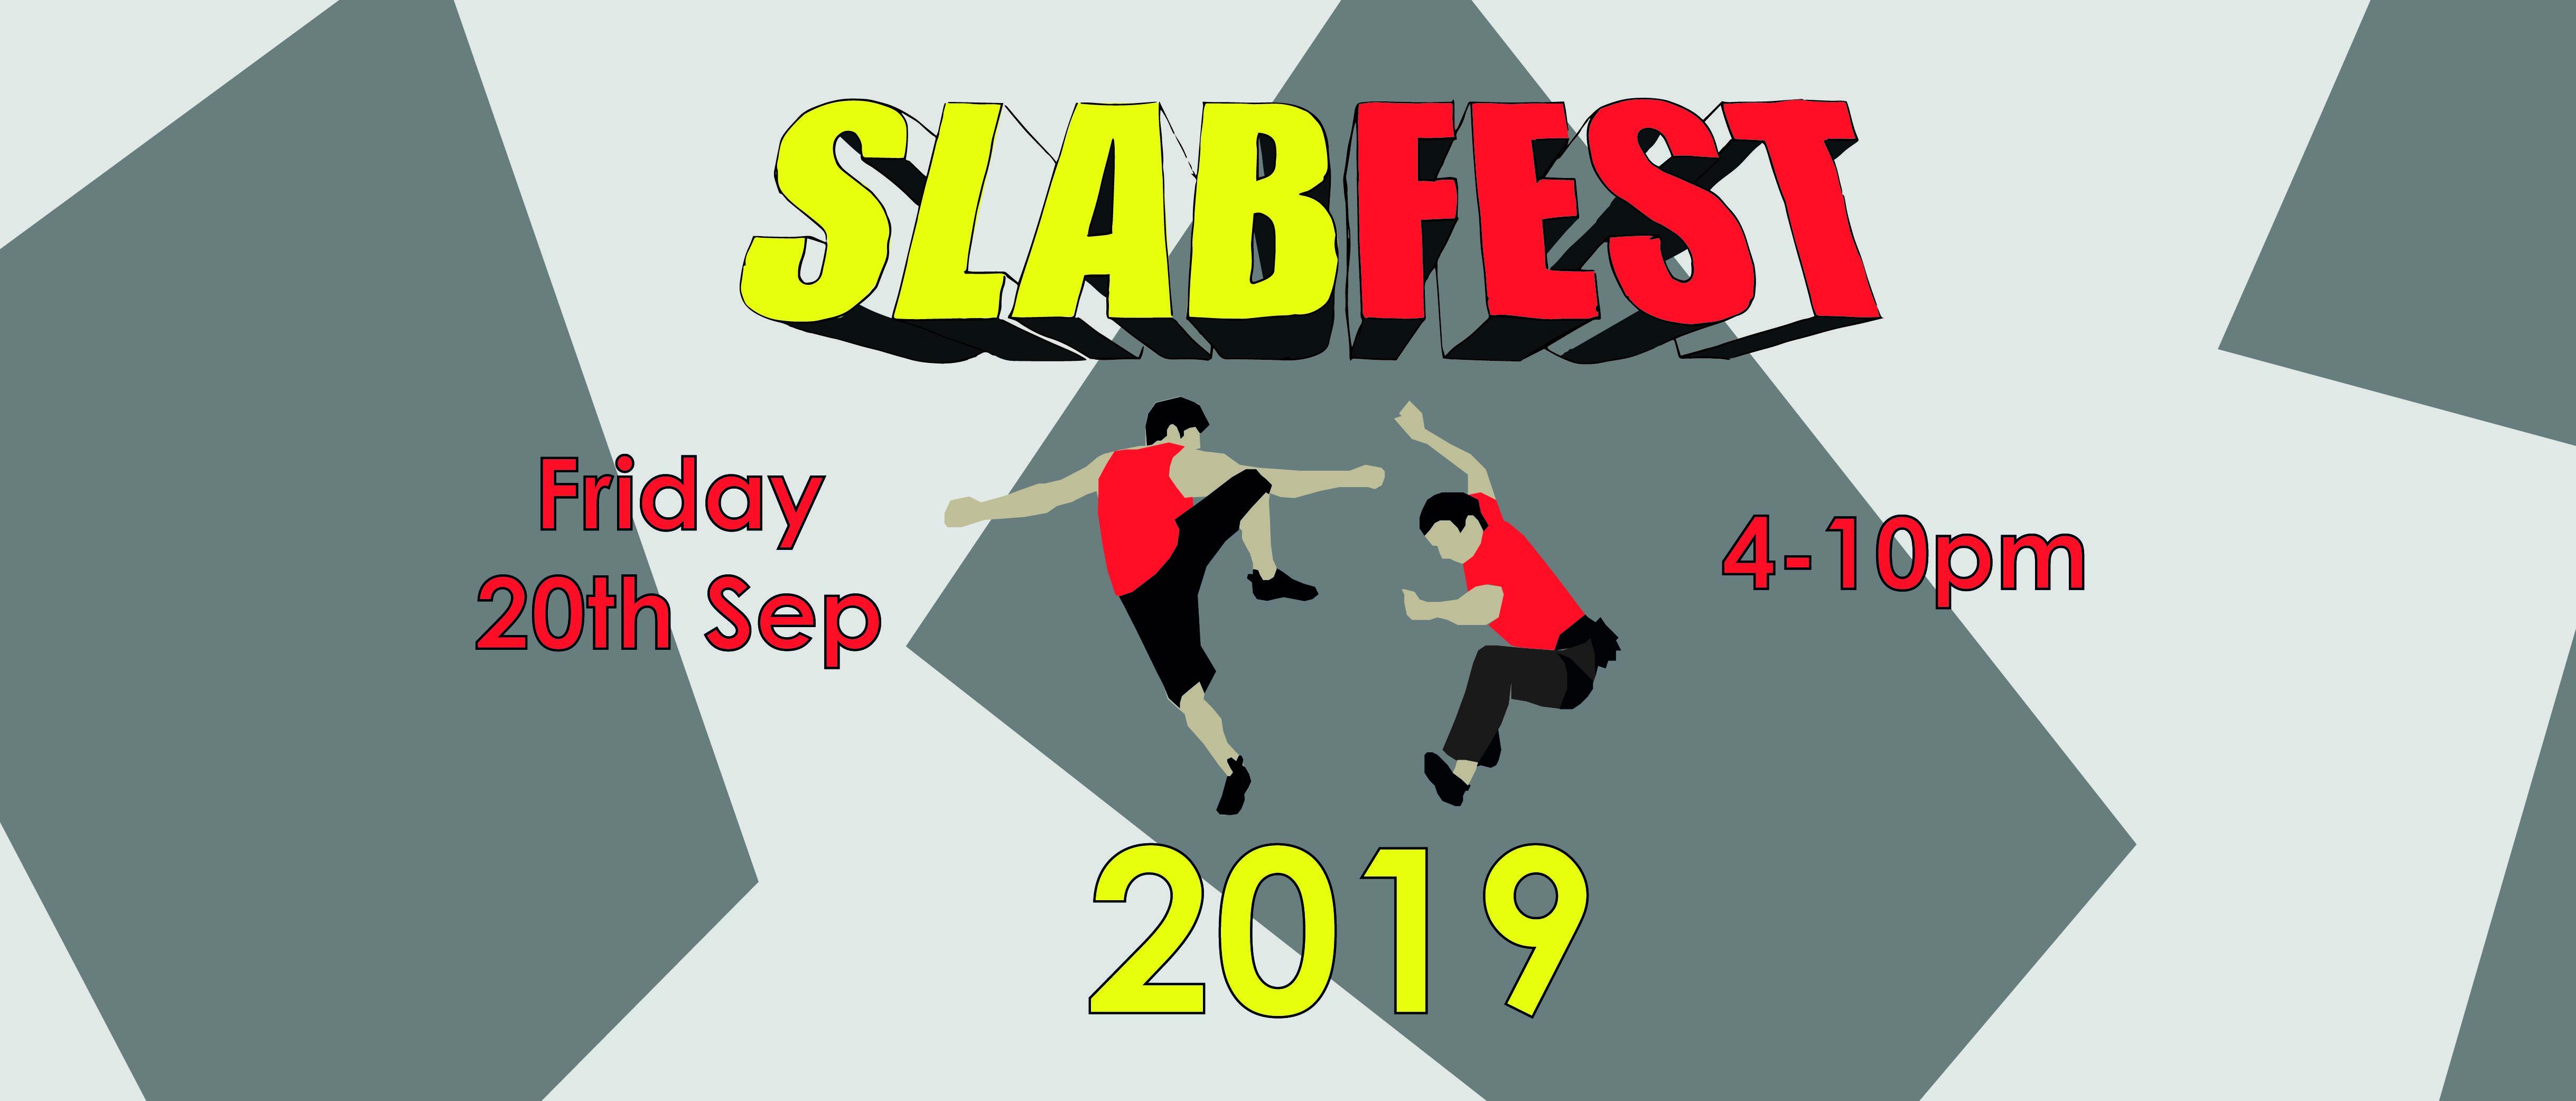 SLABFEST 2019, a festival of slab climbing. Friday 20th September, 4-10pm